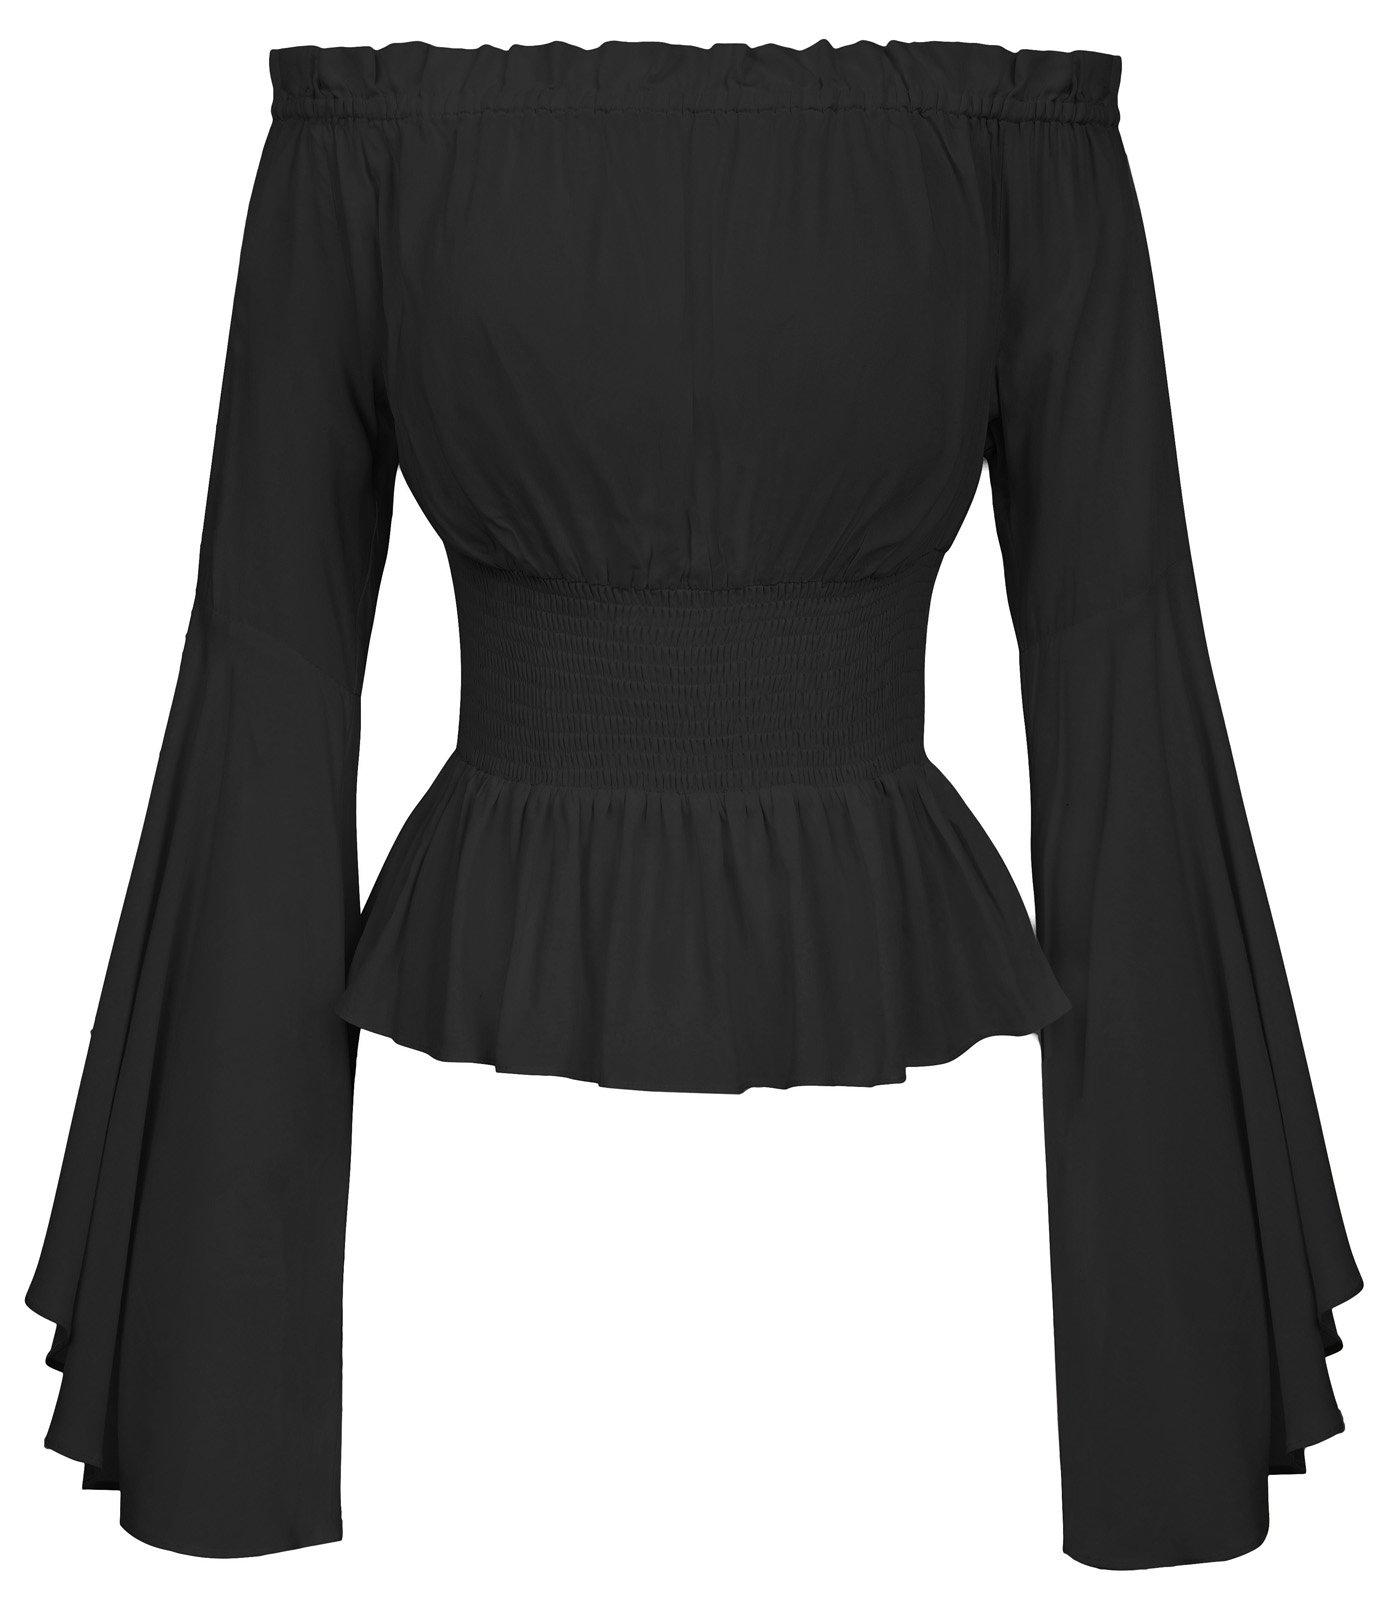 Women's Bell Sleeve Ruffle Smocked Off Shoulder Boho Top BP468-1 S Black